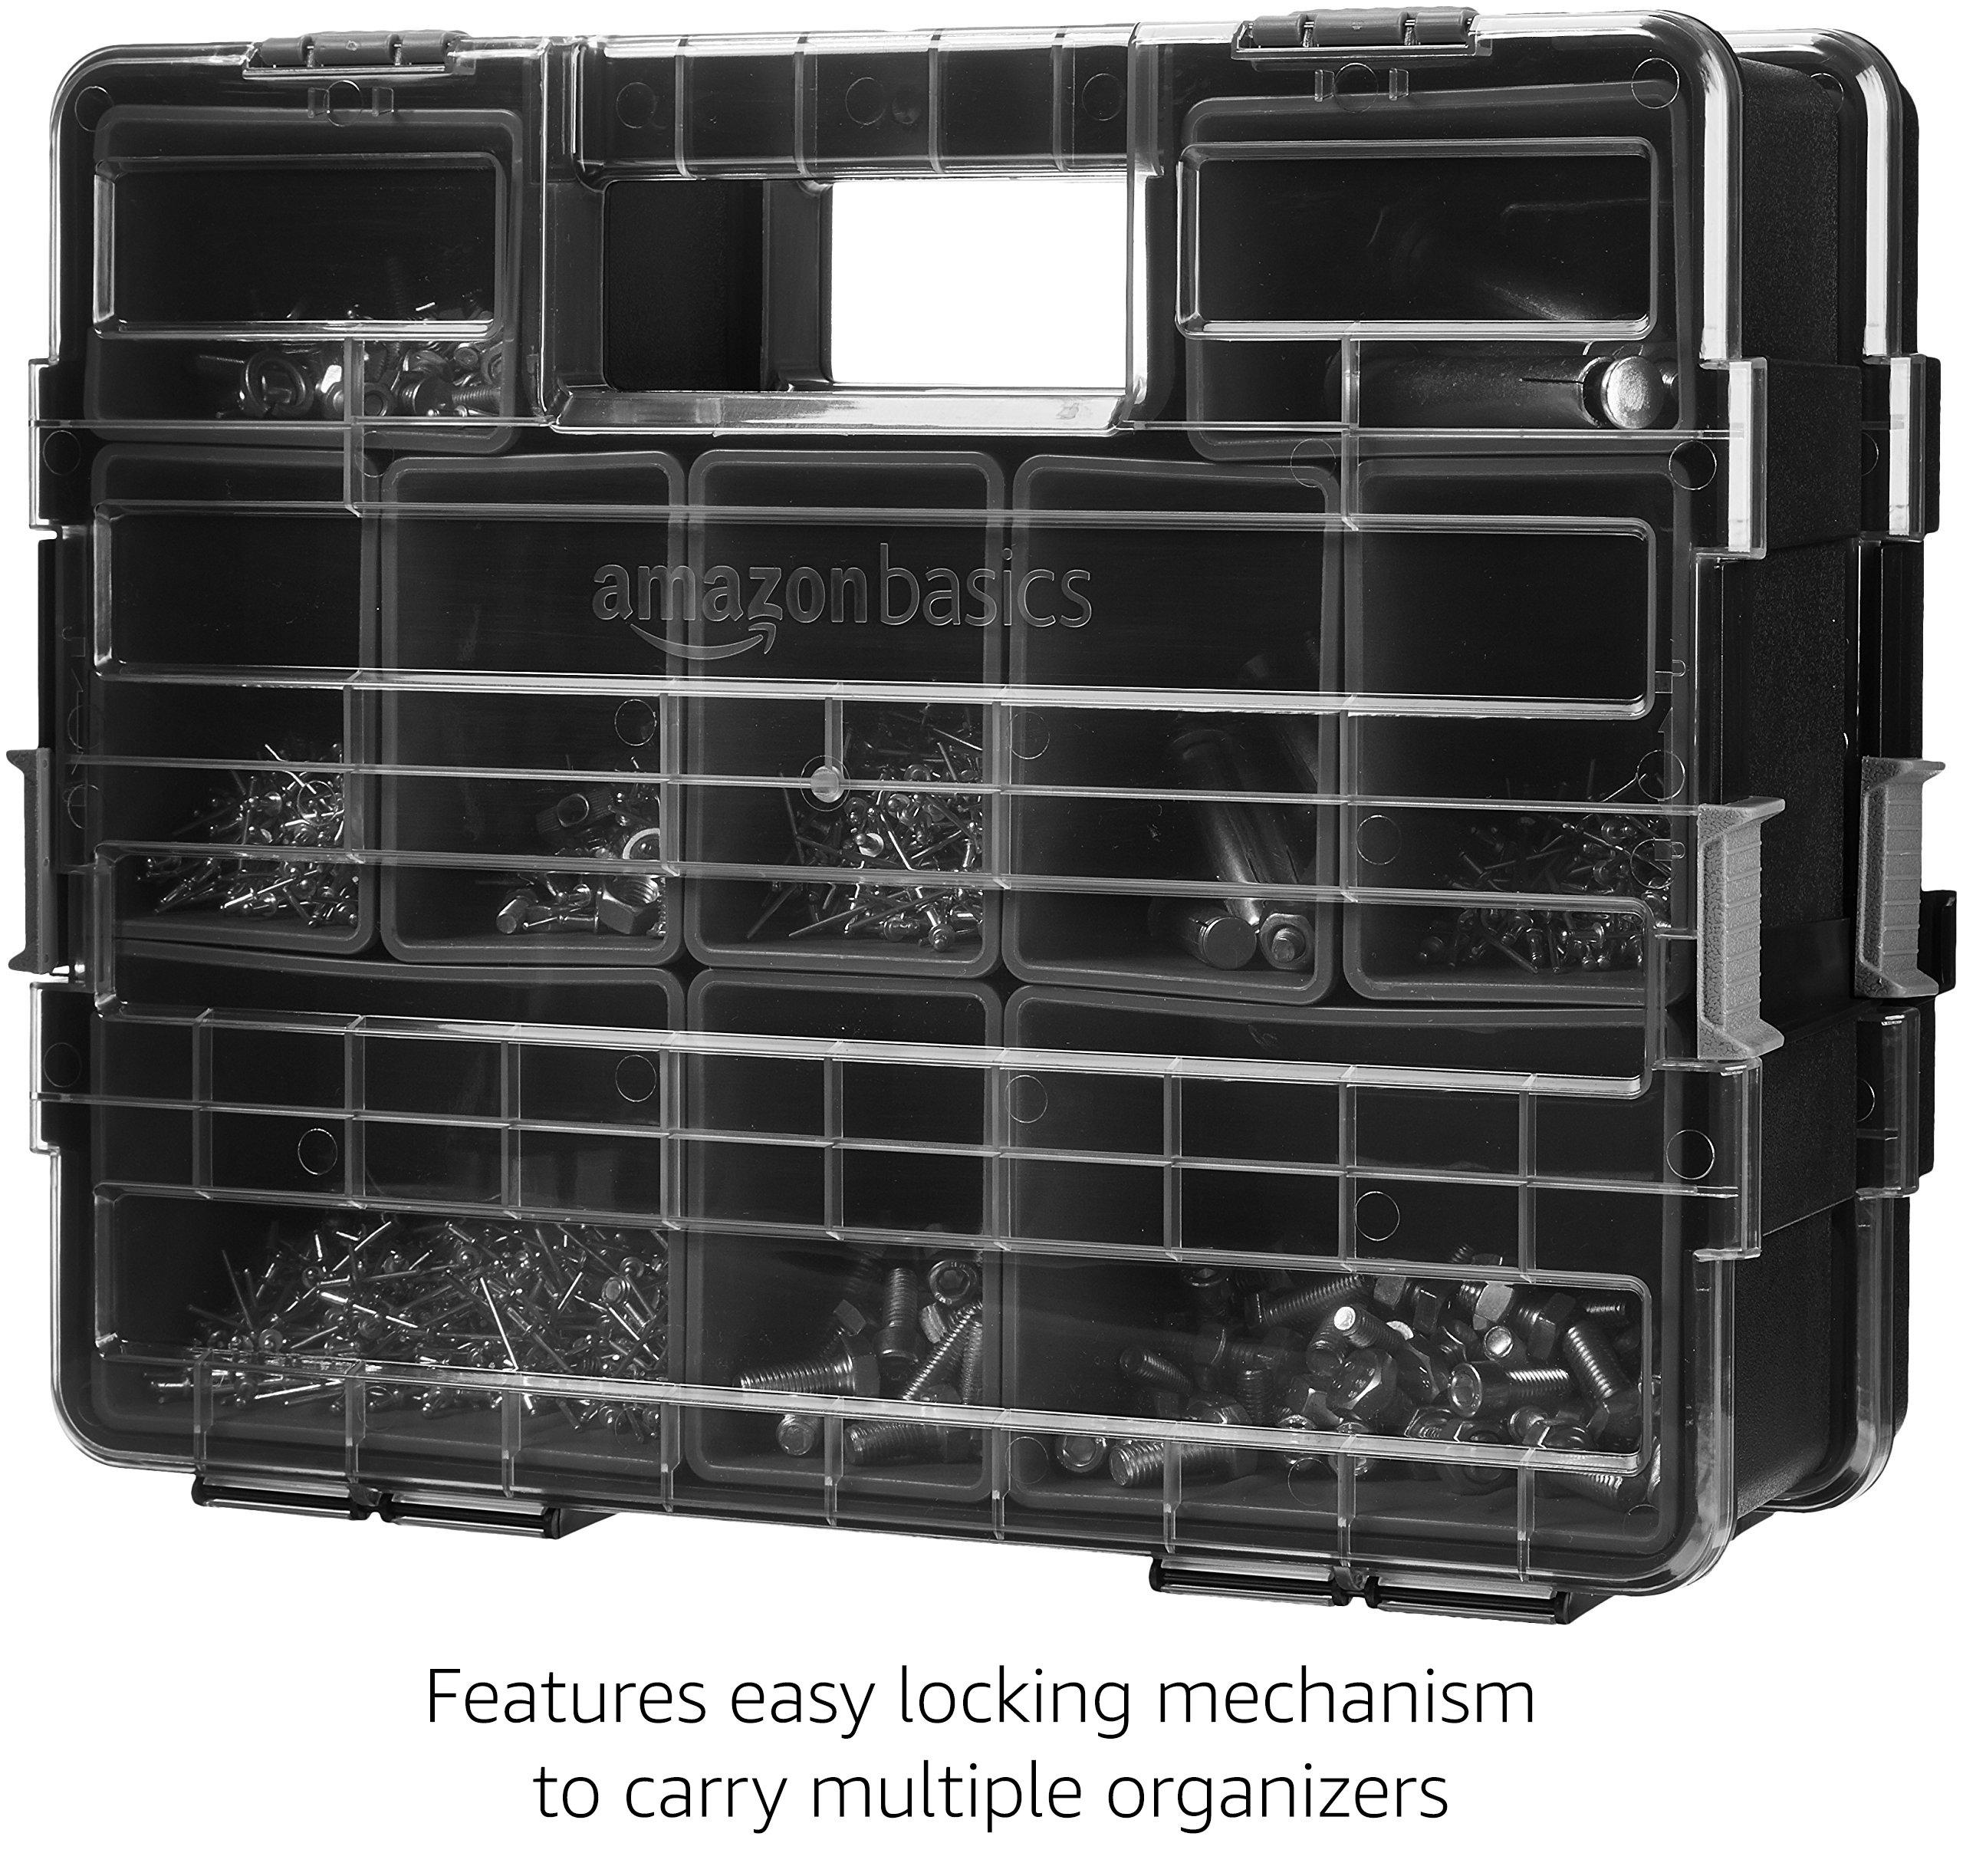 AmazonBasics Tool Organizer - 10 Compartments by AmazonBasics (Image #4)